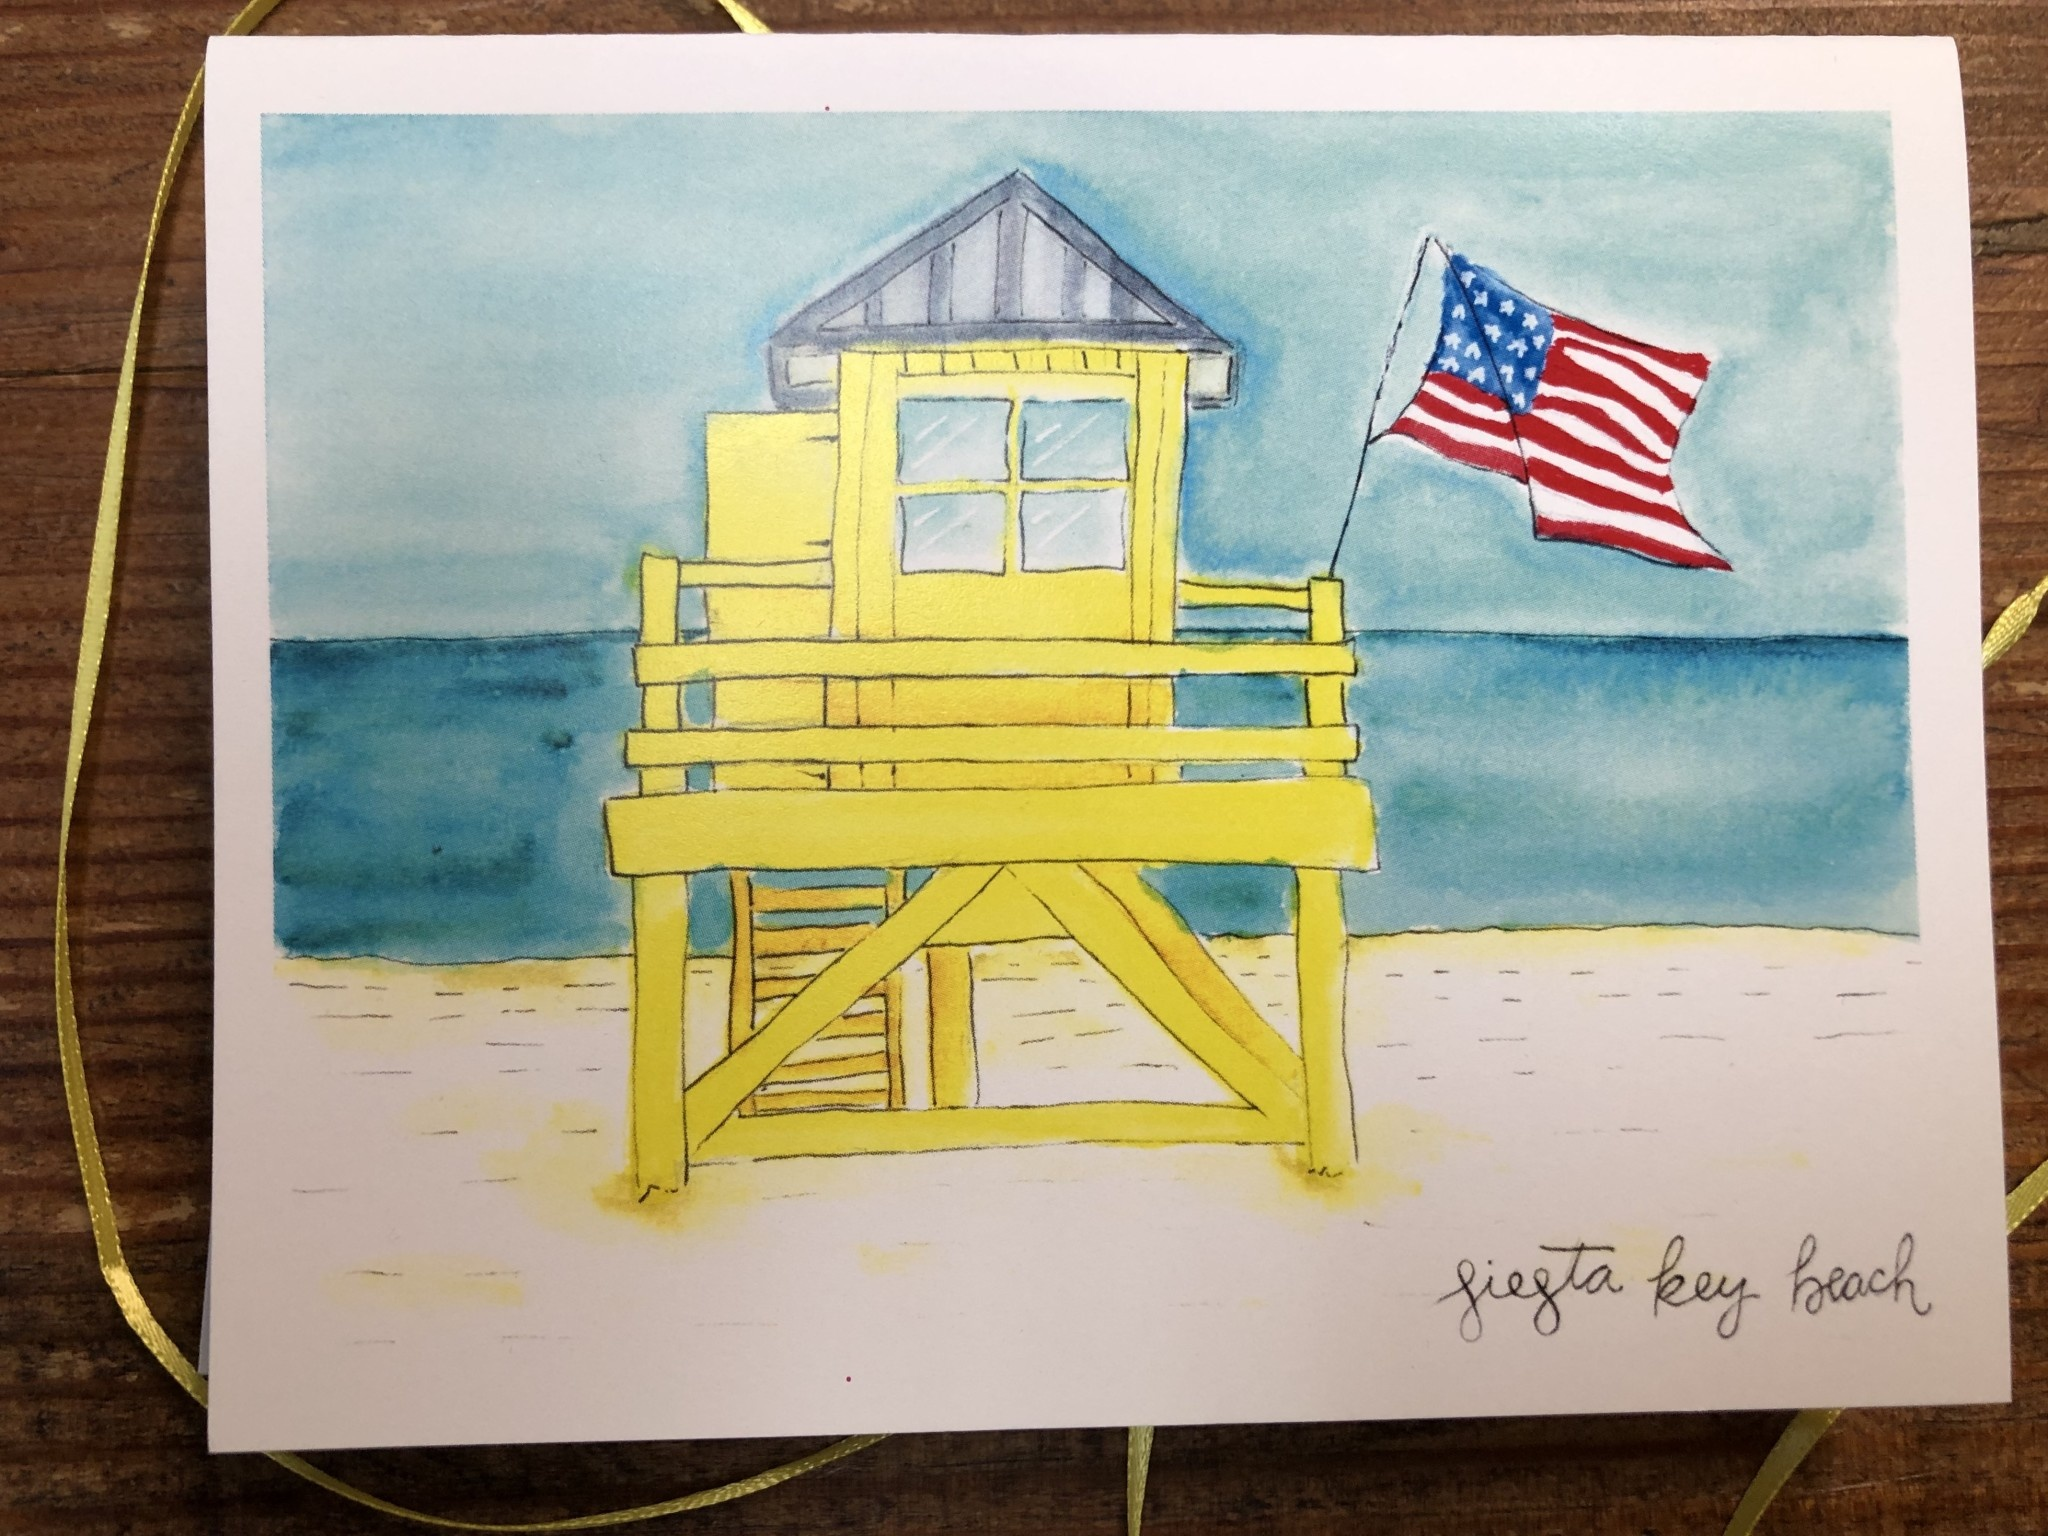 Siesta Key Beach Cards